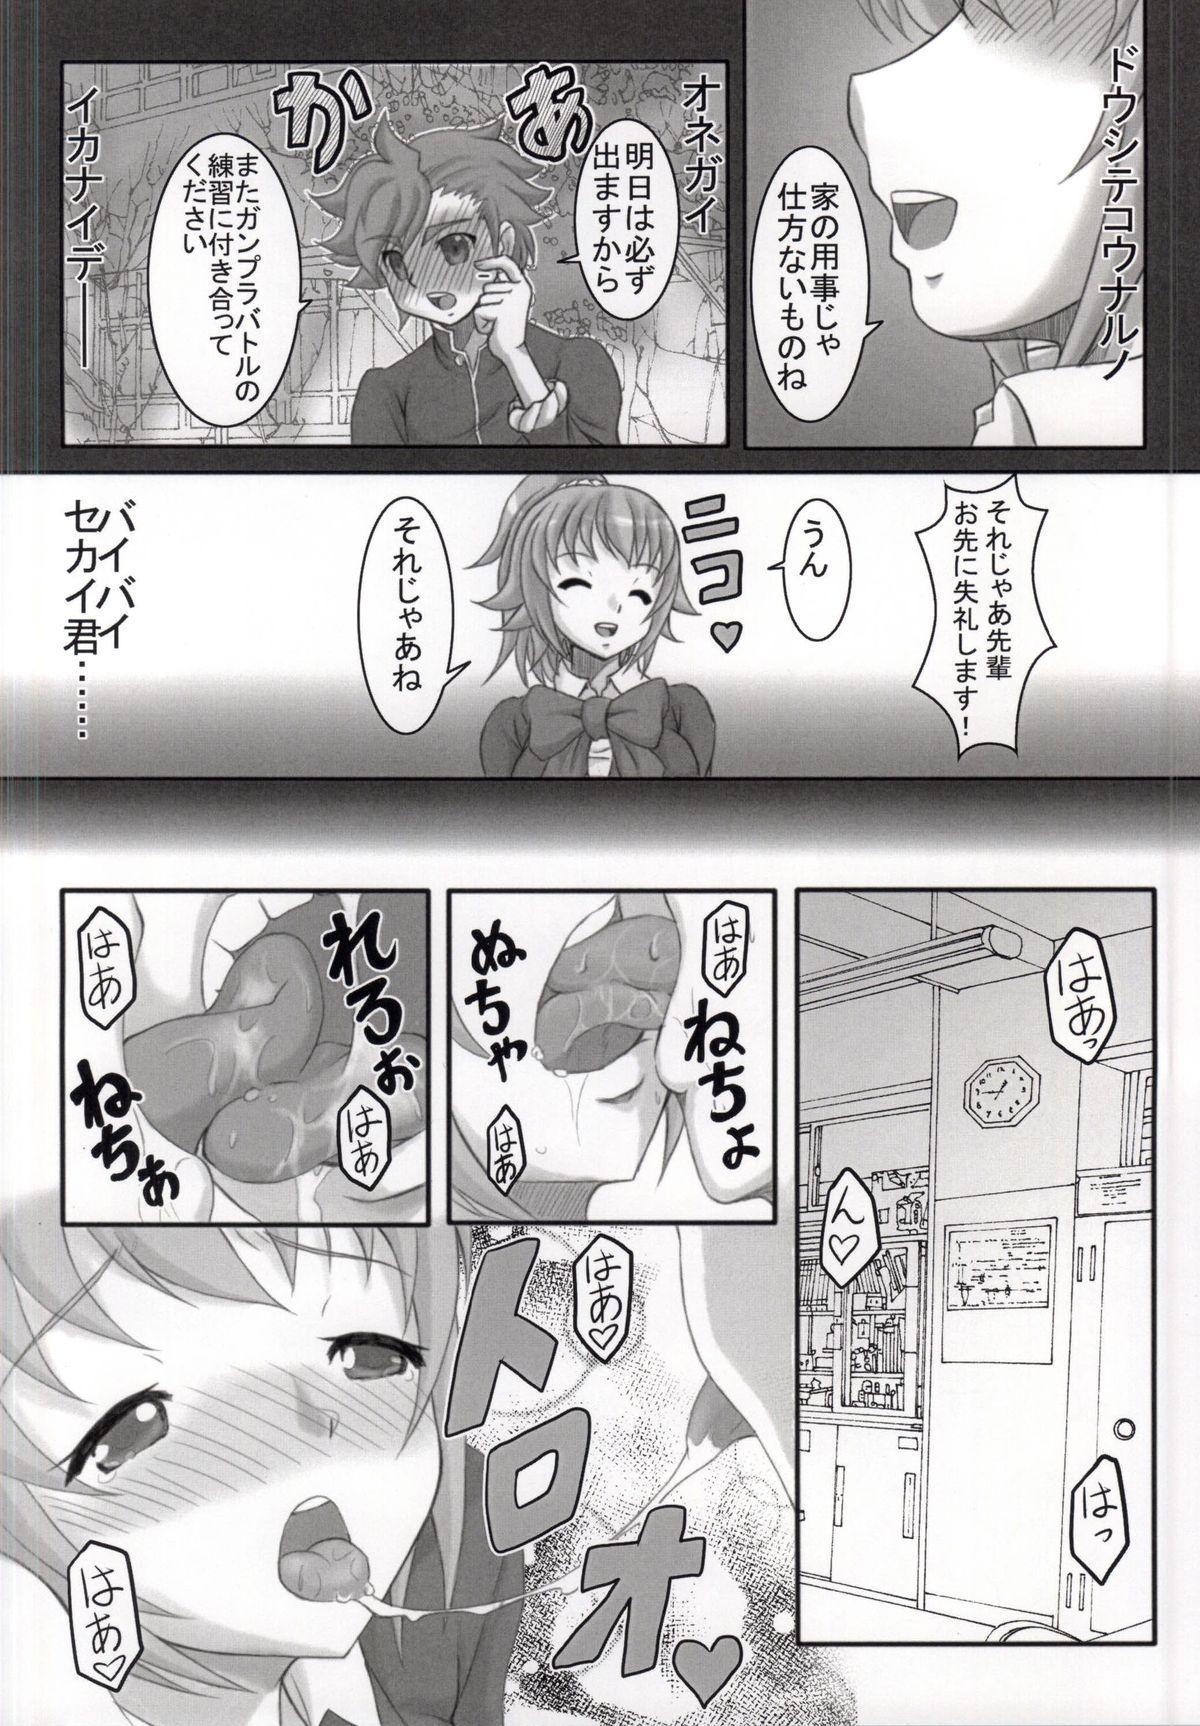 Fumina Senpai no NTR Jijou 3